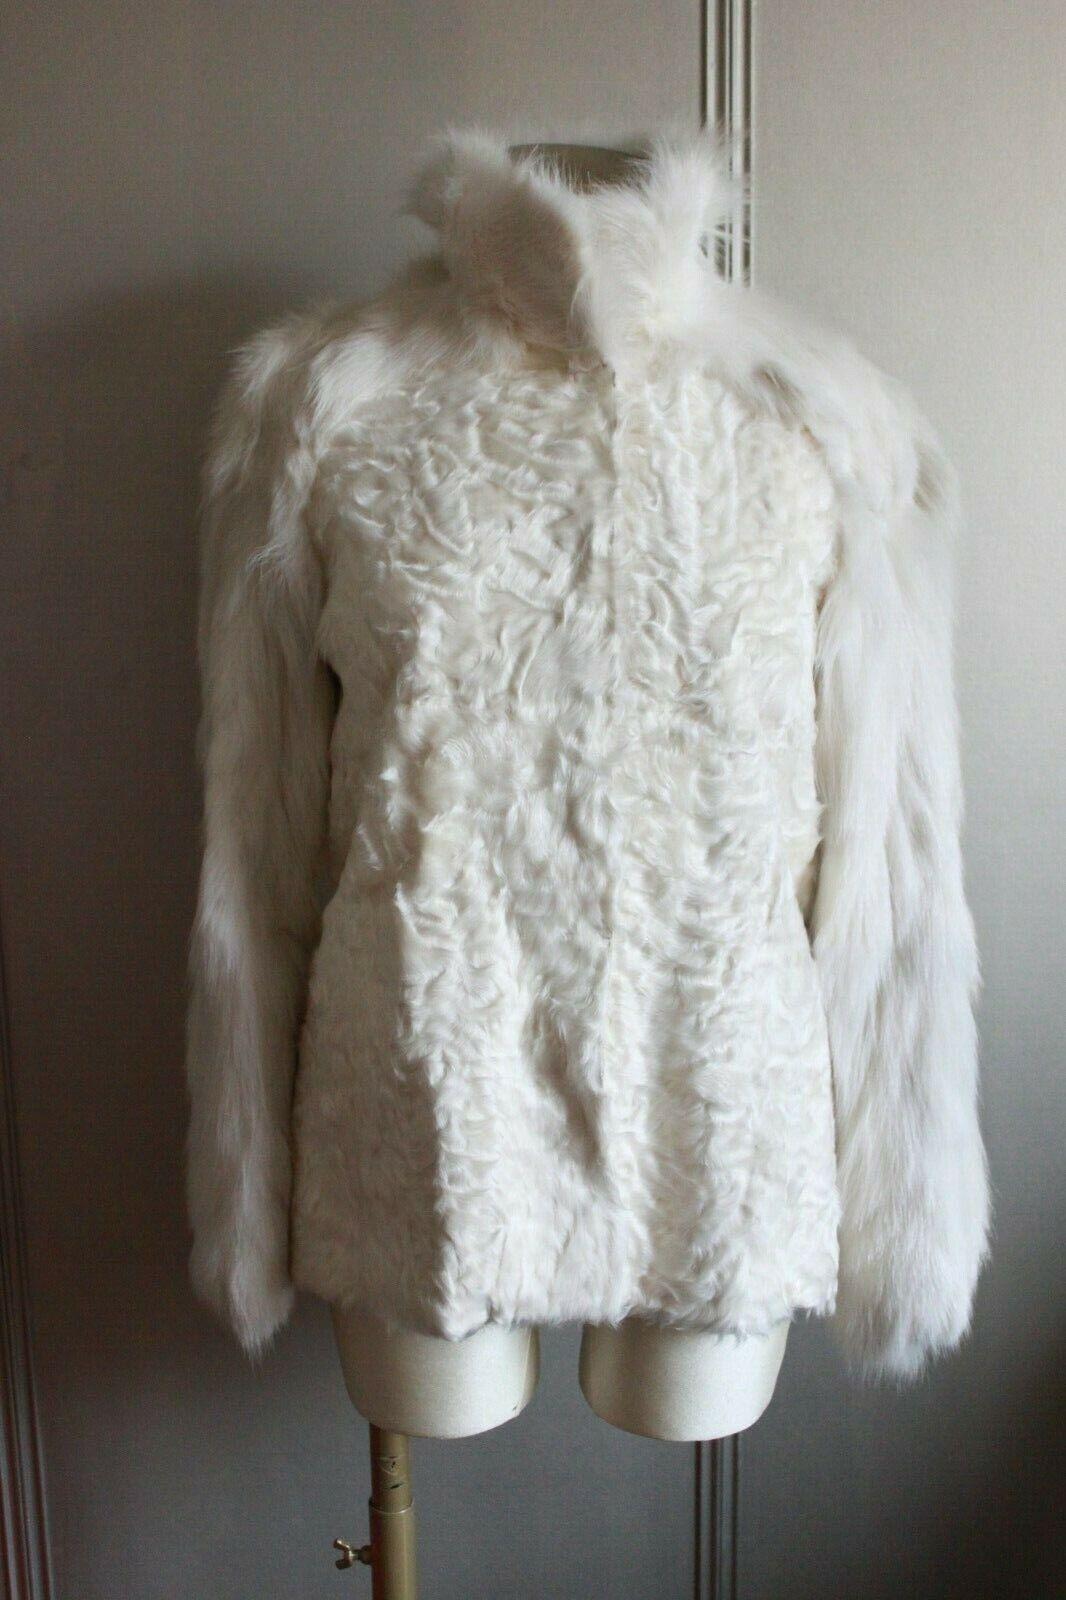 Manteau fourrure yves salomon neuf t38 / brand new fur coat yves salomon